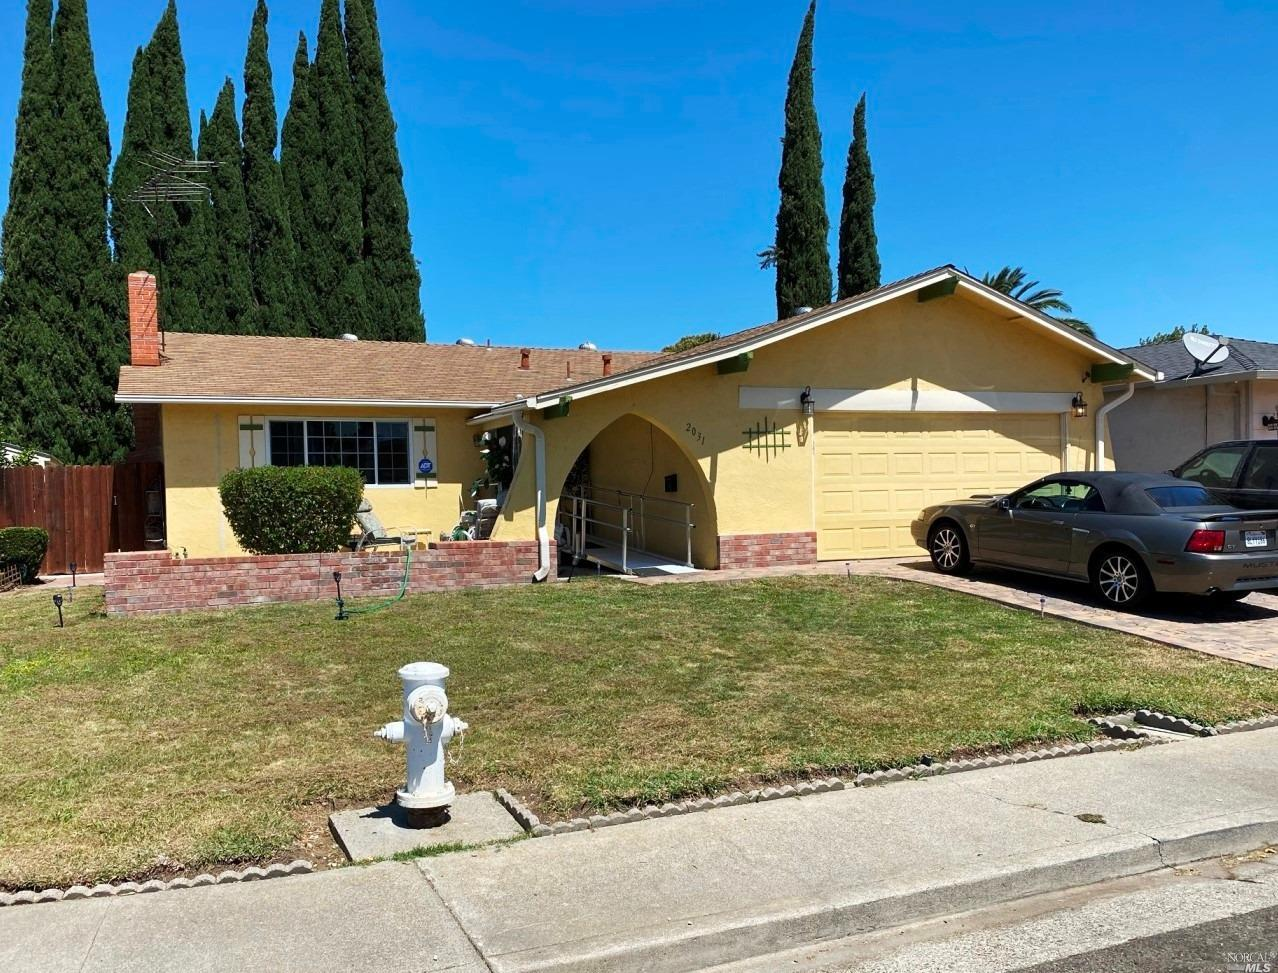 2031 Cormorant Drive, Fairfield CA 94533